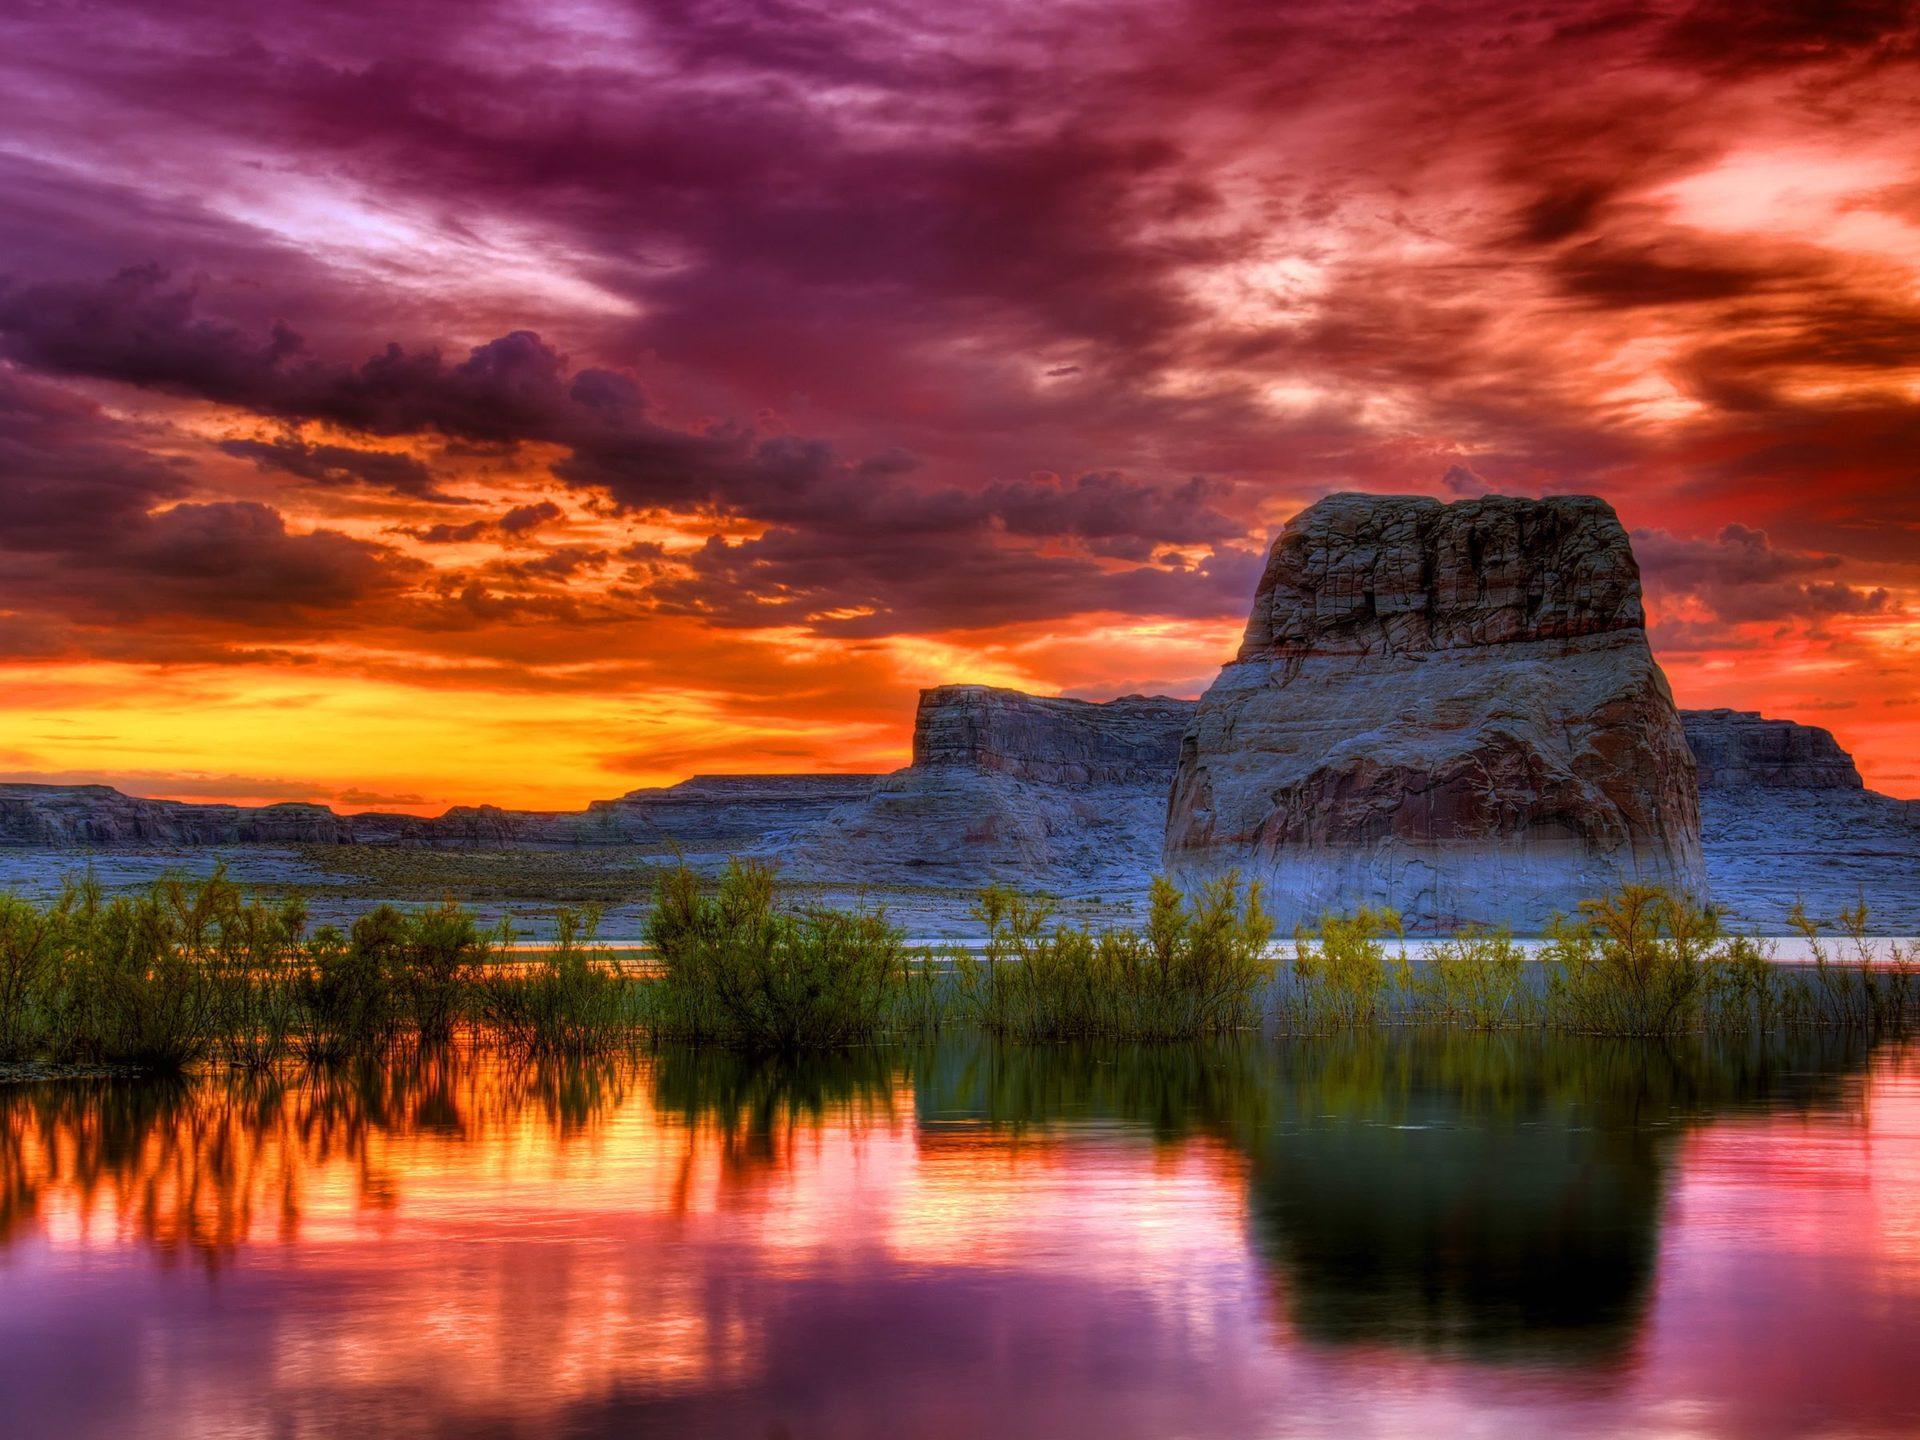 Iphone Wallpaper Rose Arizona Sunset Scenery Lake Rocky Mountains Orange Clouds